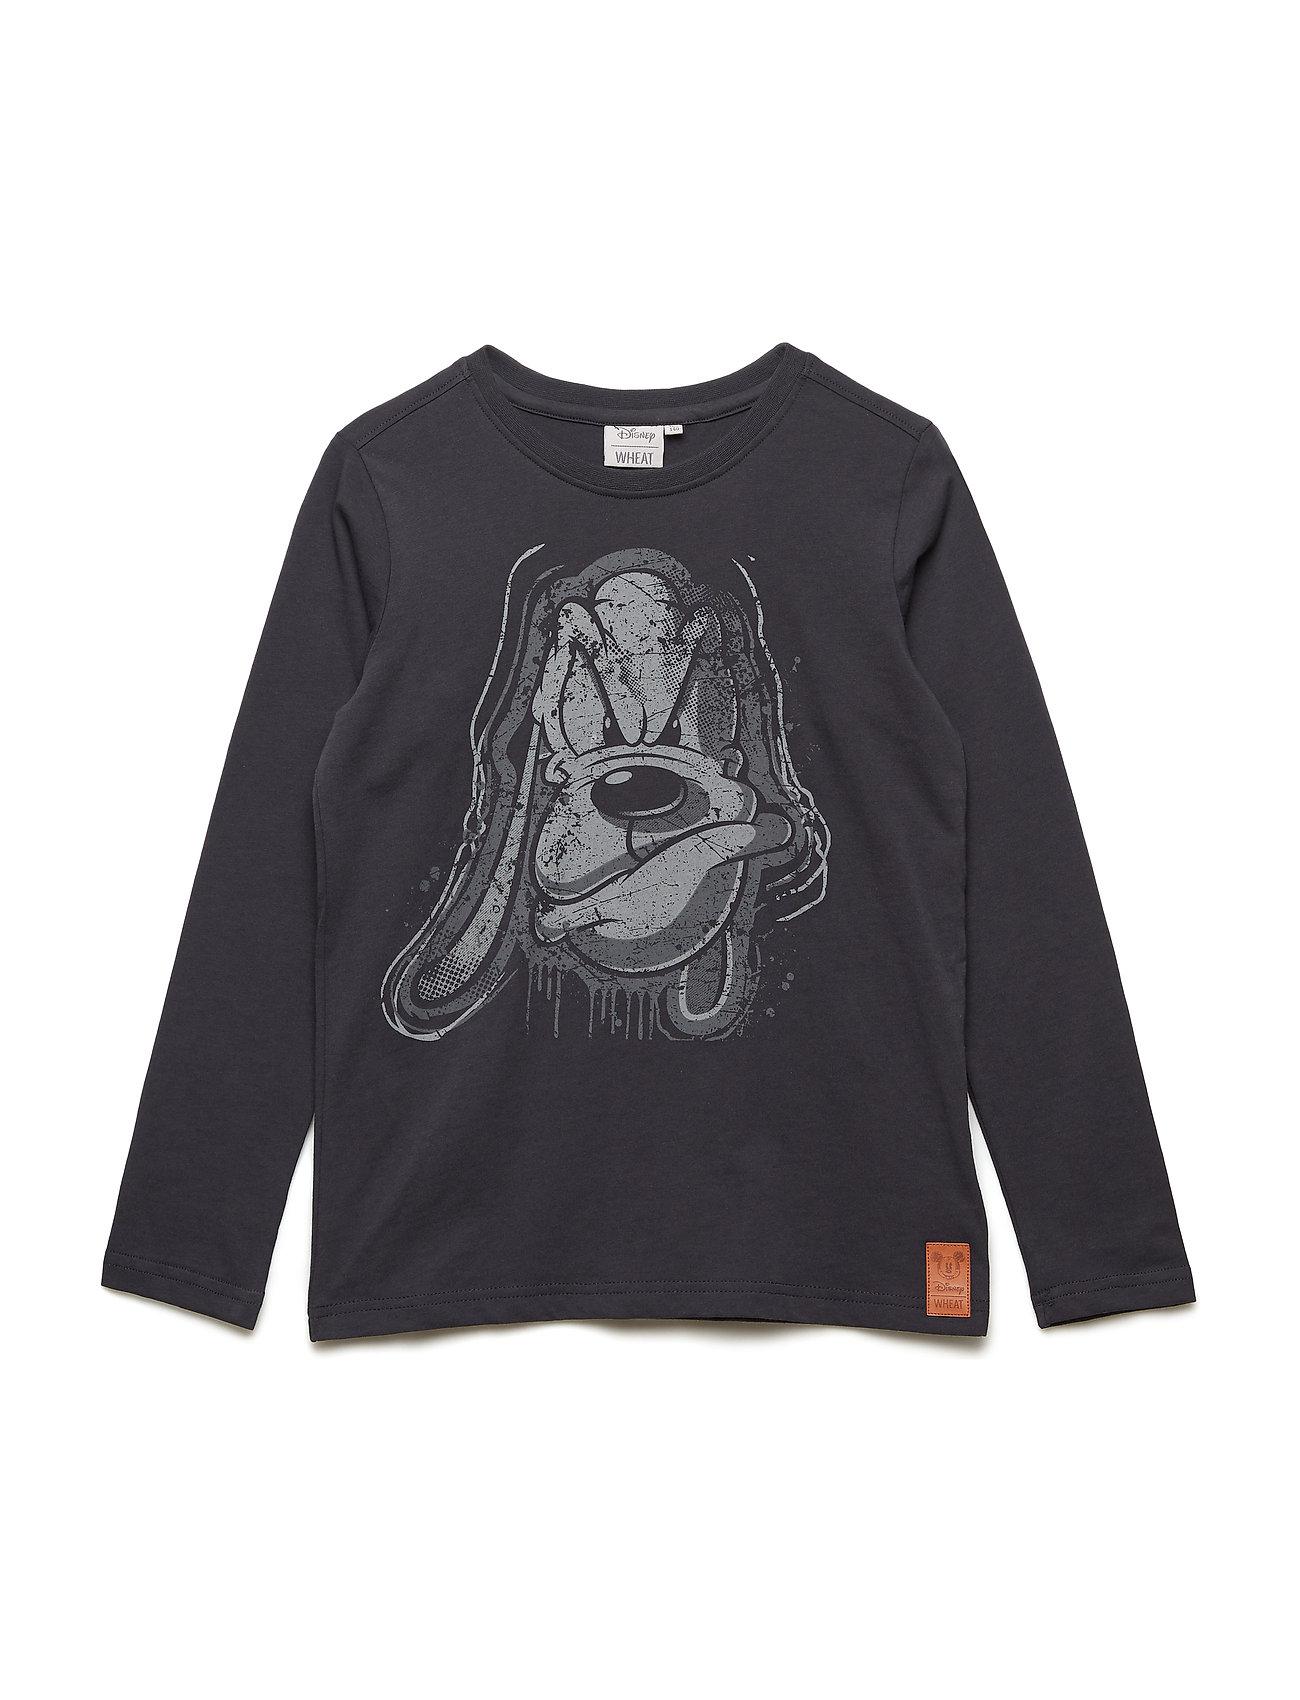 Image of T-Shirt Pluto Langærmet T-shirt Sort DISNEY BY WHEAT (3111745943)